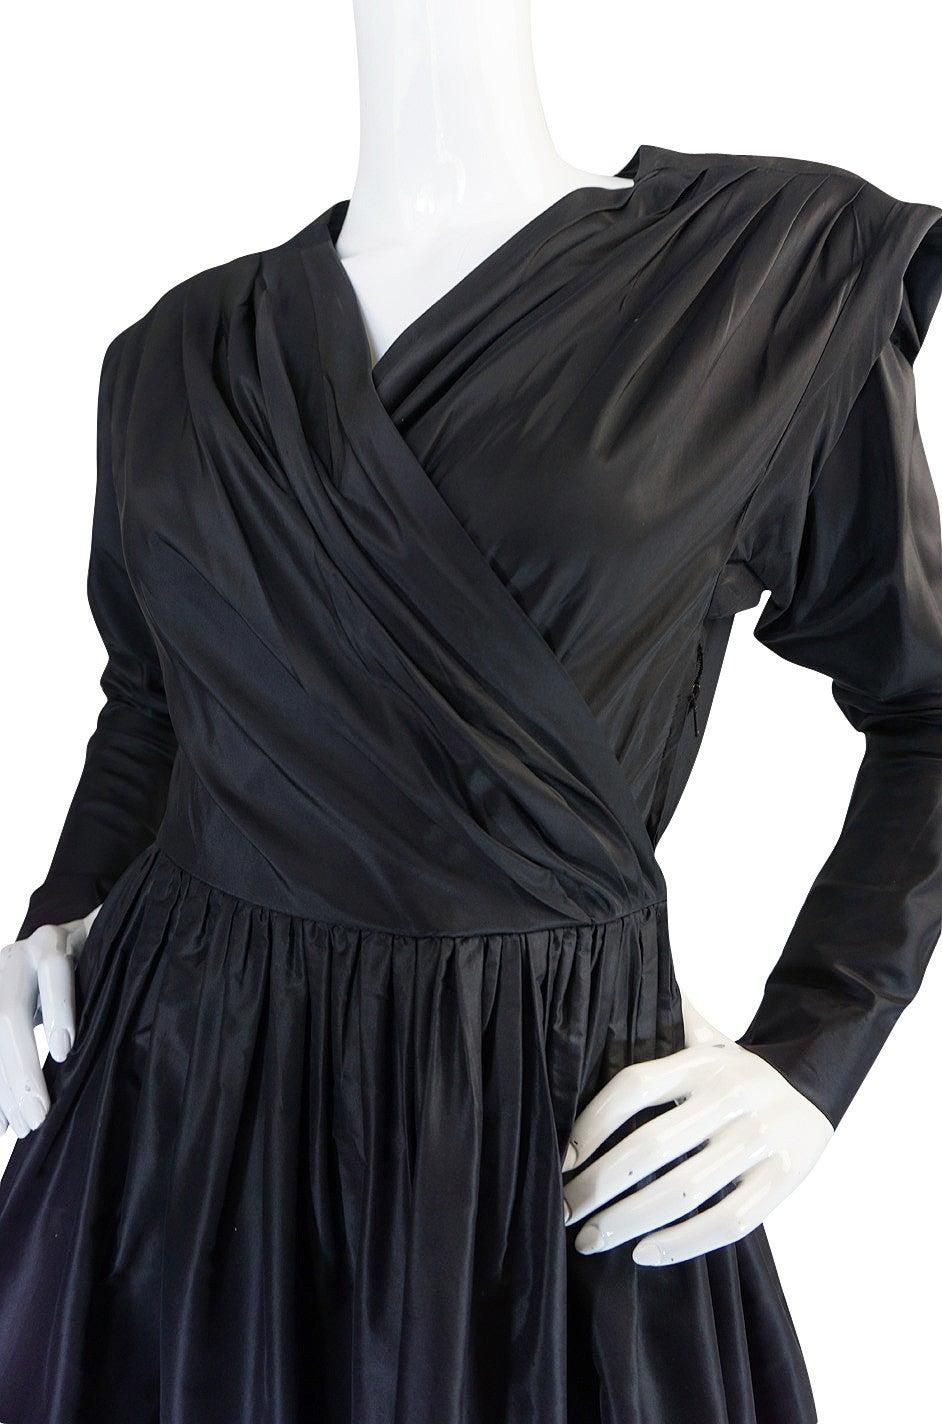 Exceptional 1970s Yves Saint Laurent Black Silk Dress 7